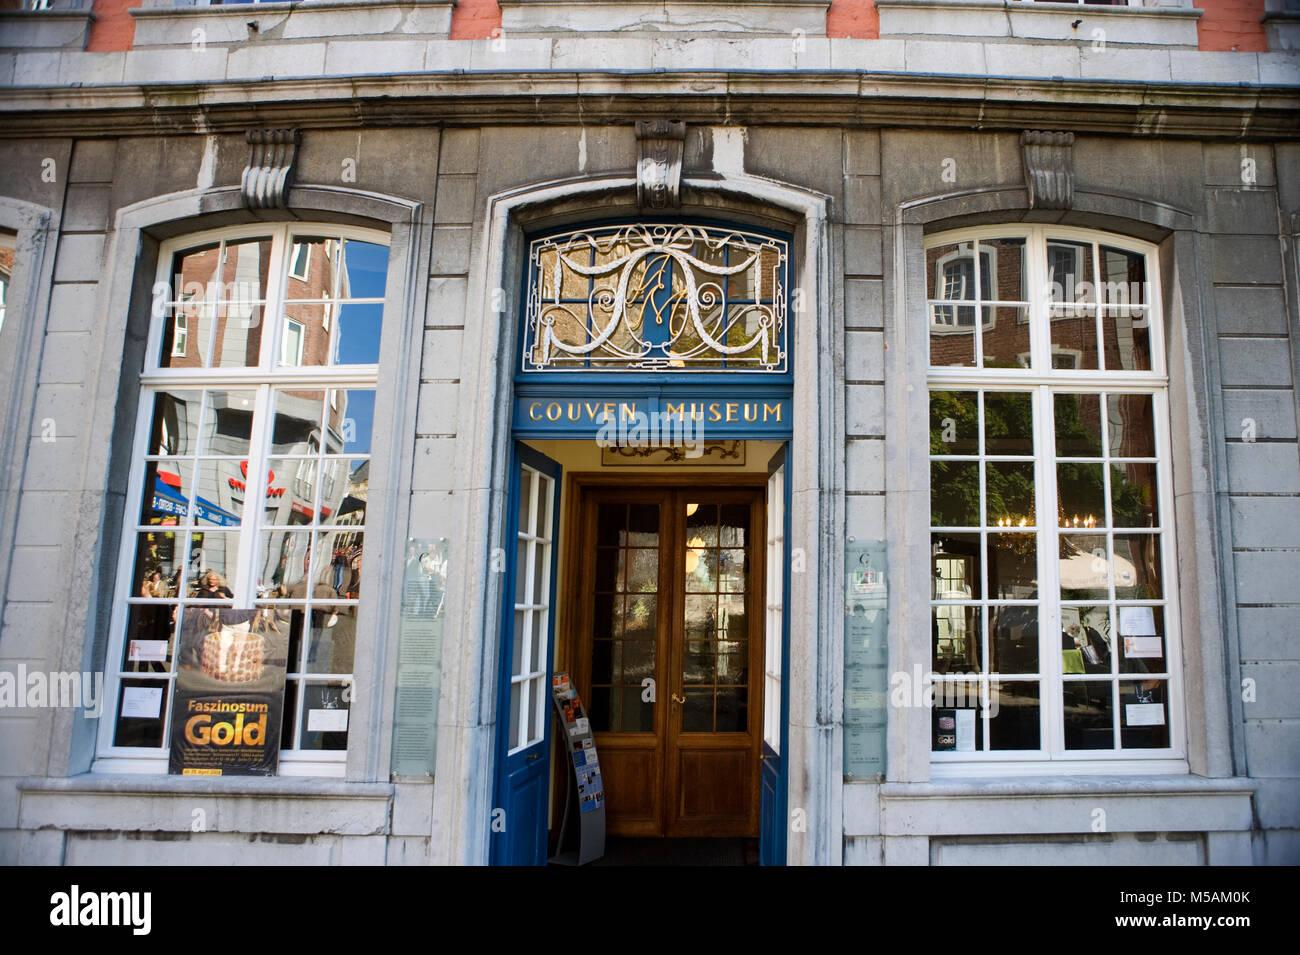 Couven-Museum, Aachen, Aix-la-Chapelle, Nordrhein-Westfalen, Deutschland Stockbild